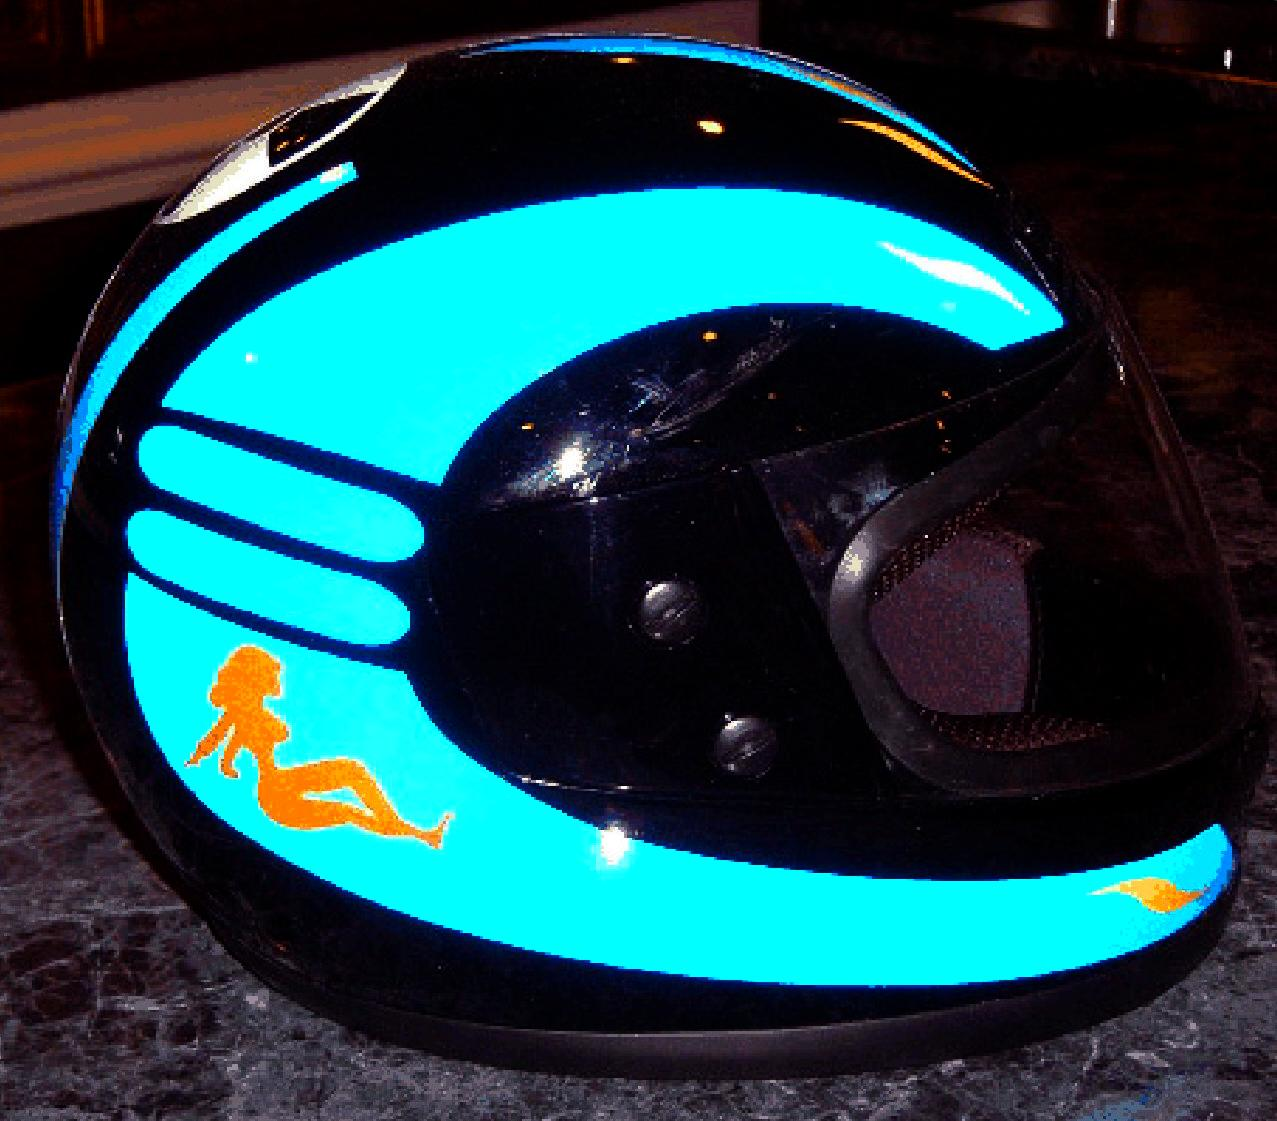 Reflective Helmet Stickers Images Reverse Search - Custom reflective helmet decals stickers